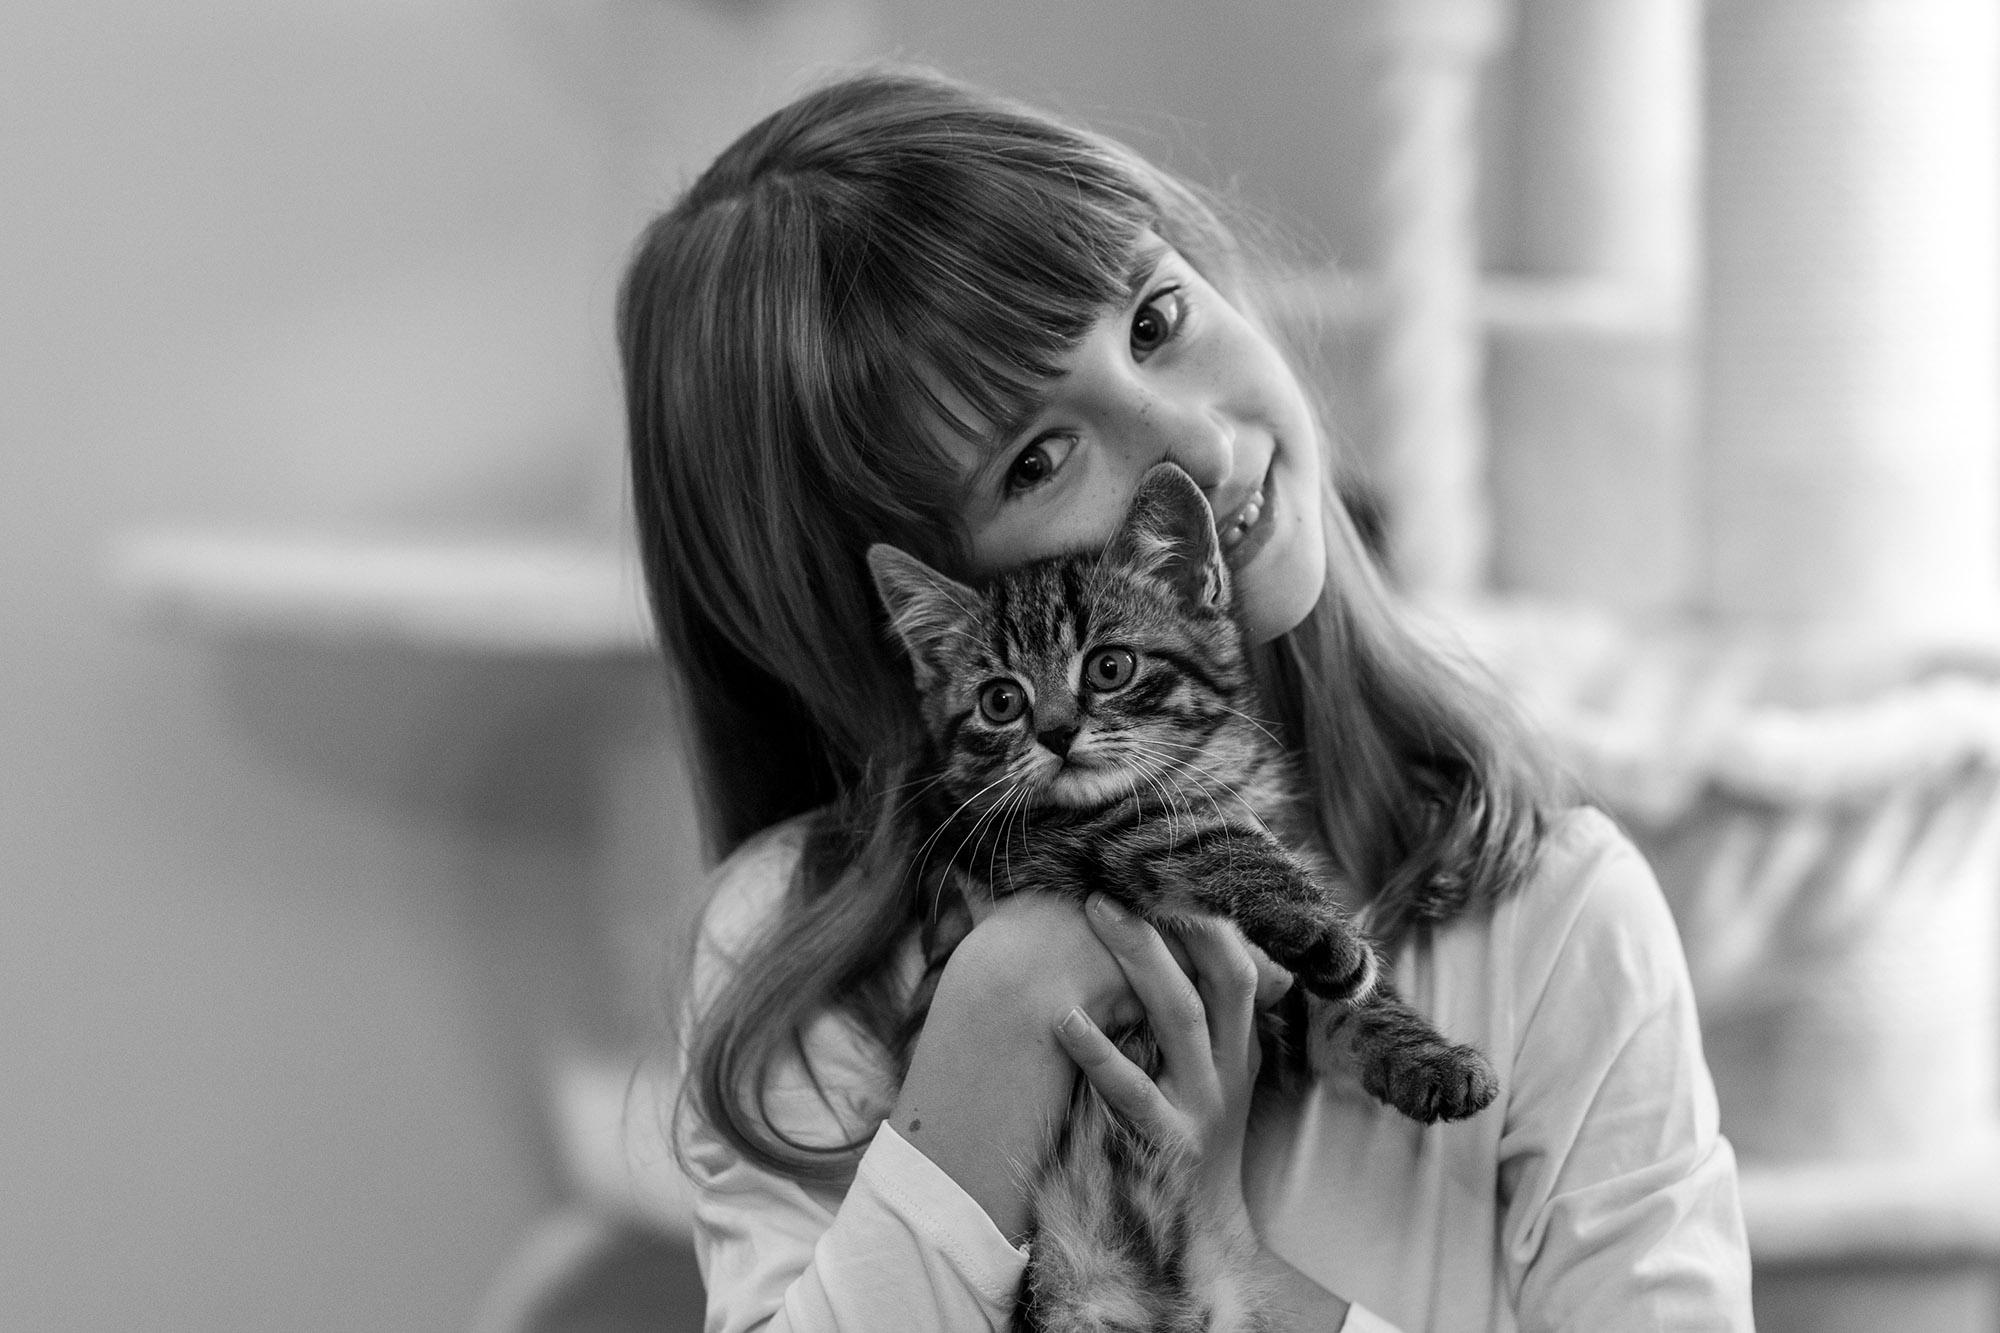 Kinderfotografie Fotografie Kurs Basel - Home Fotoshooting mit dem Kind und Haustier